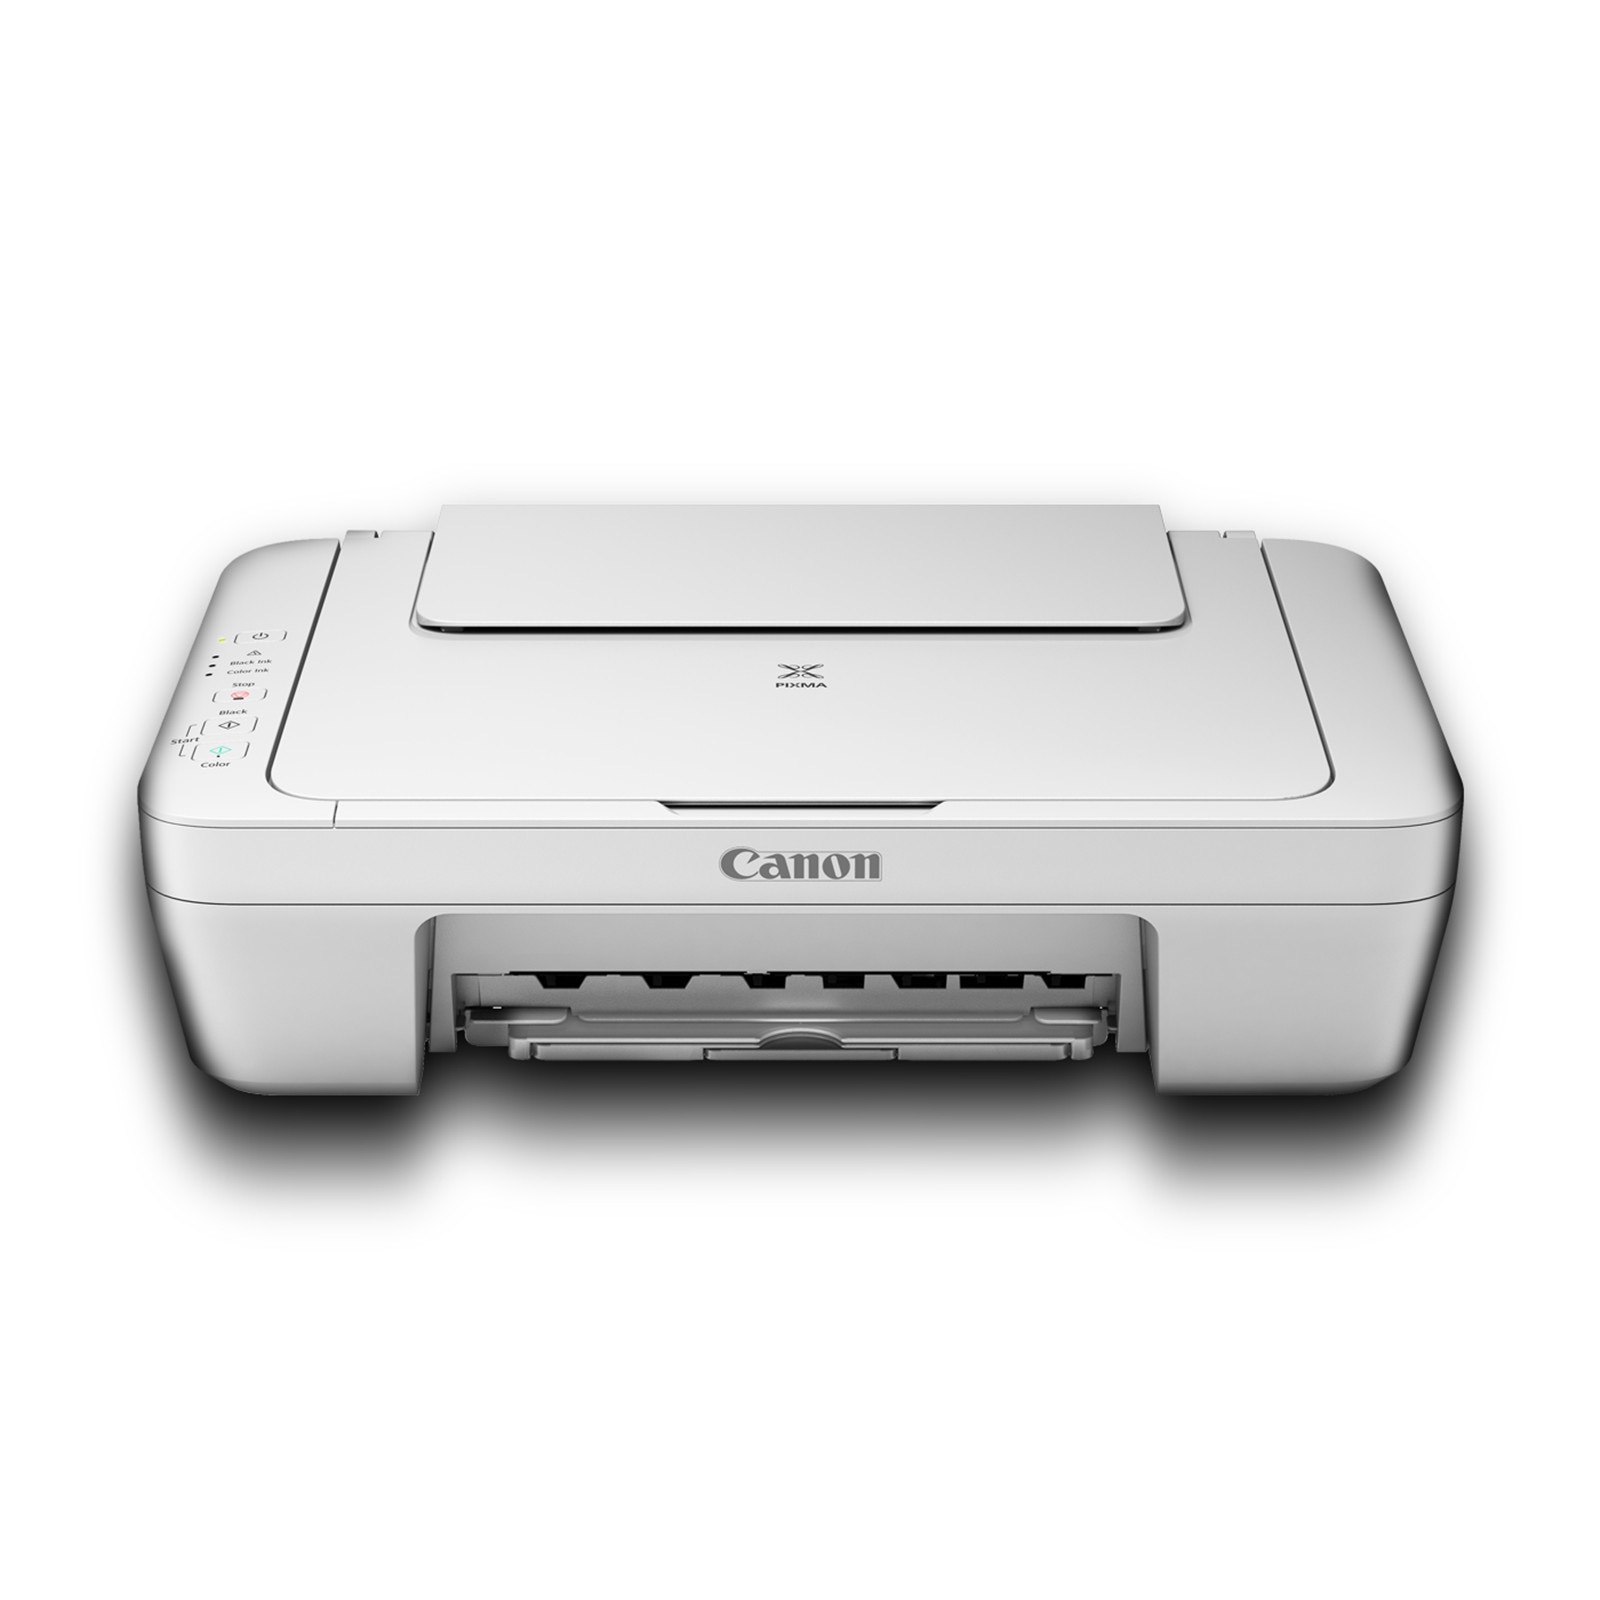 Buy The Canon Pixma Mg2560 Inkjet Multifunction Printer Colour